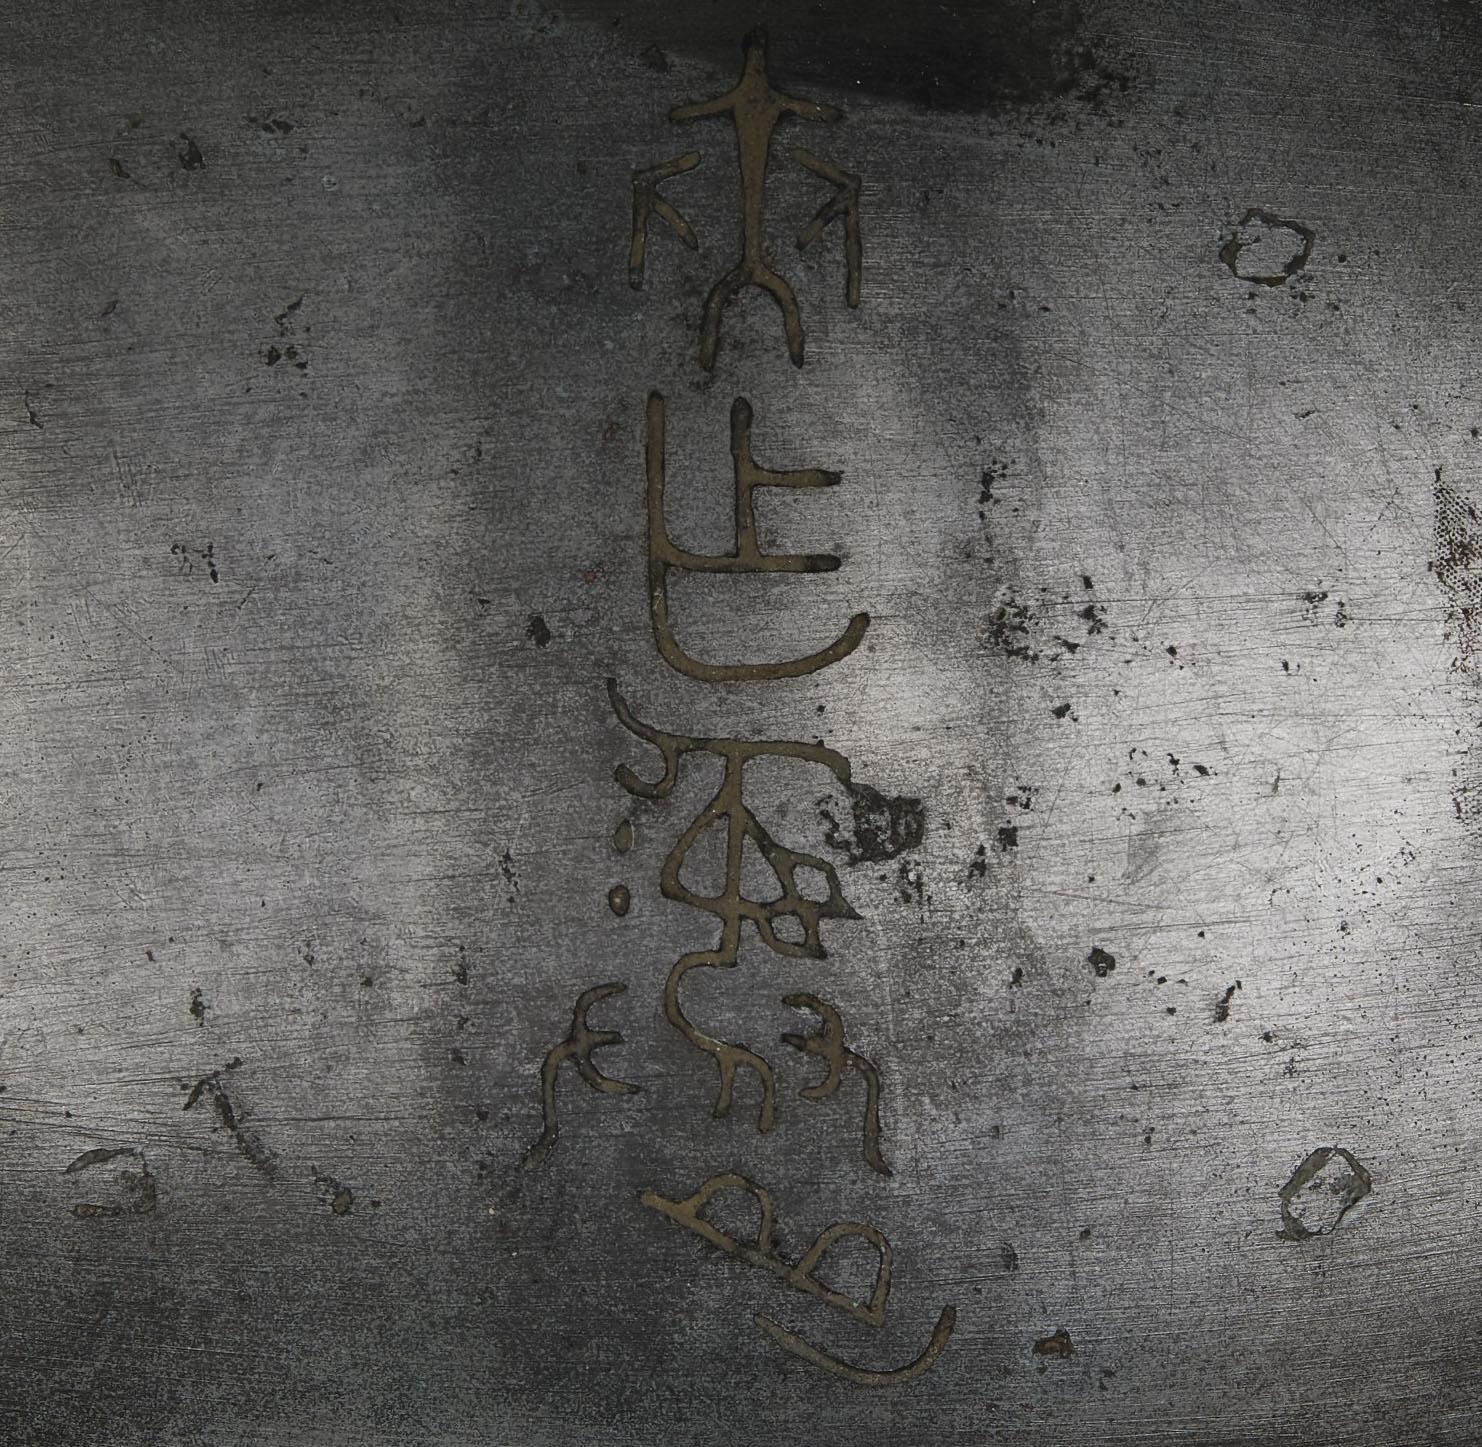 THE JIA FANGHU A RARE BRONZE RITUAL WINE VESSEL AND COVER